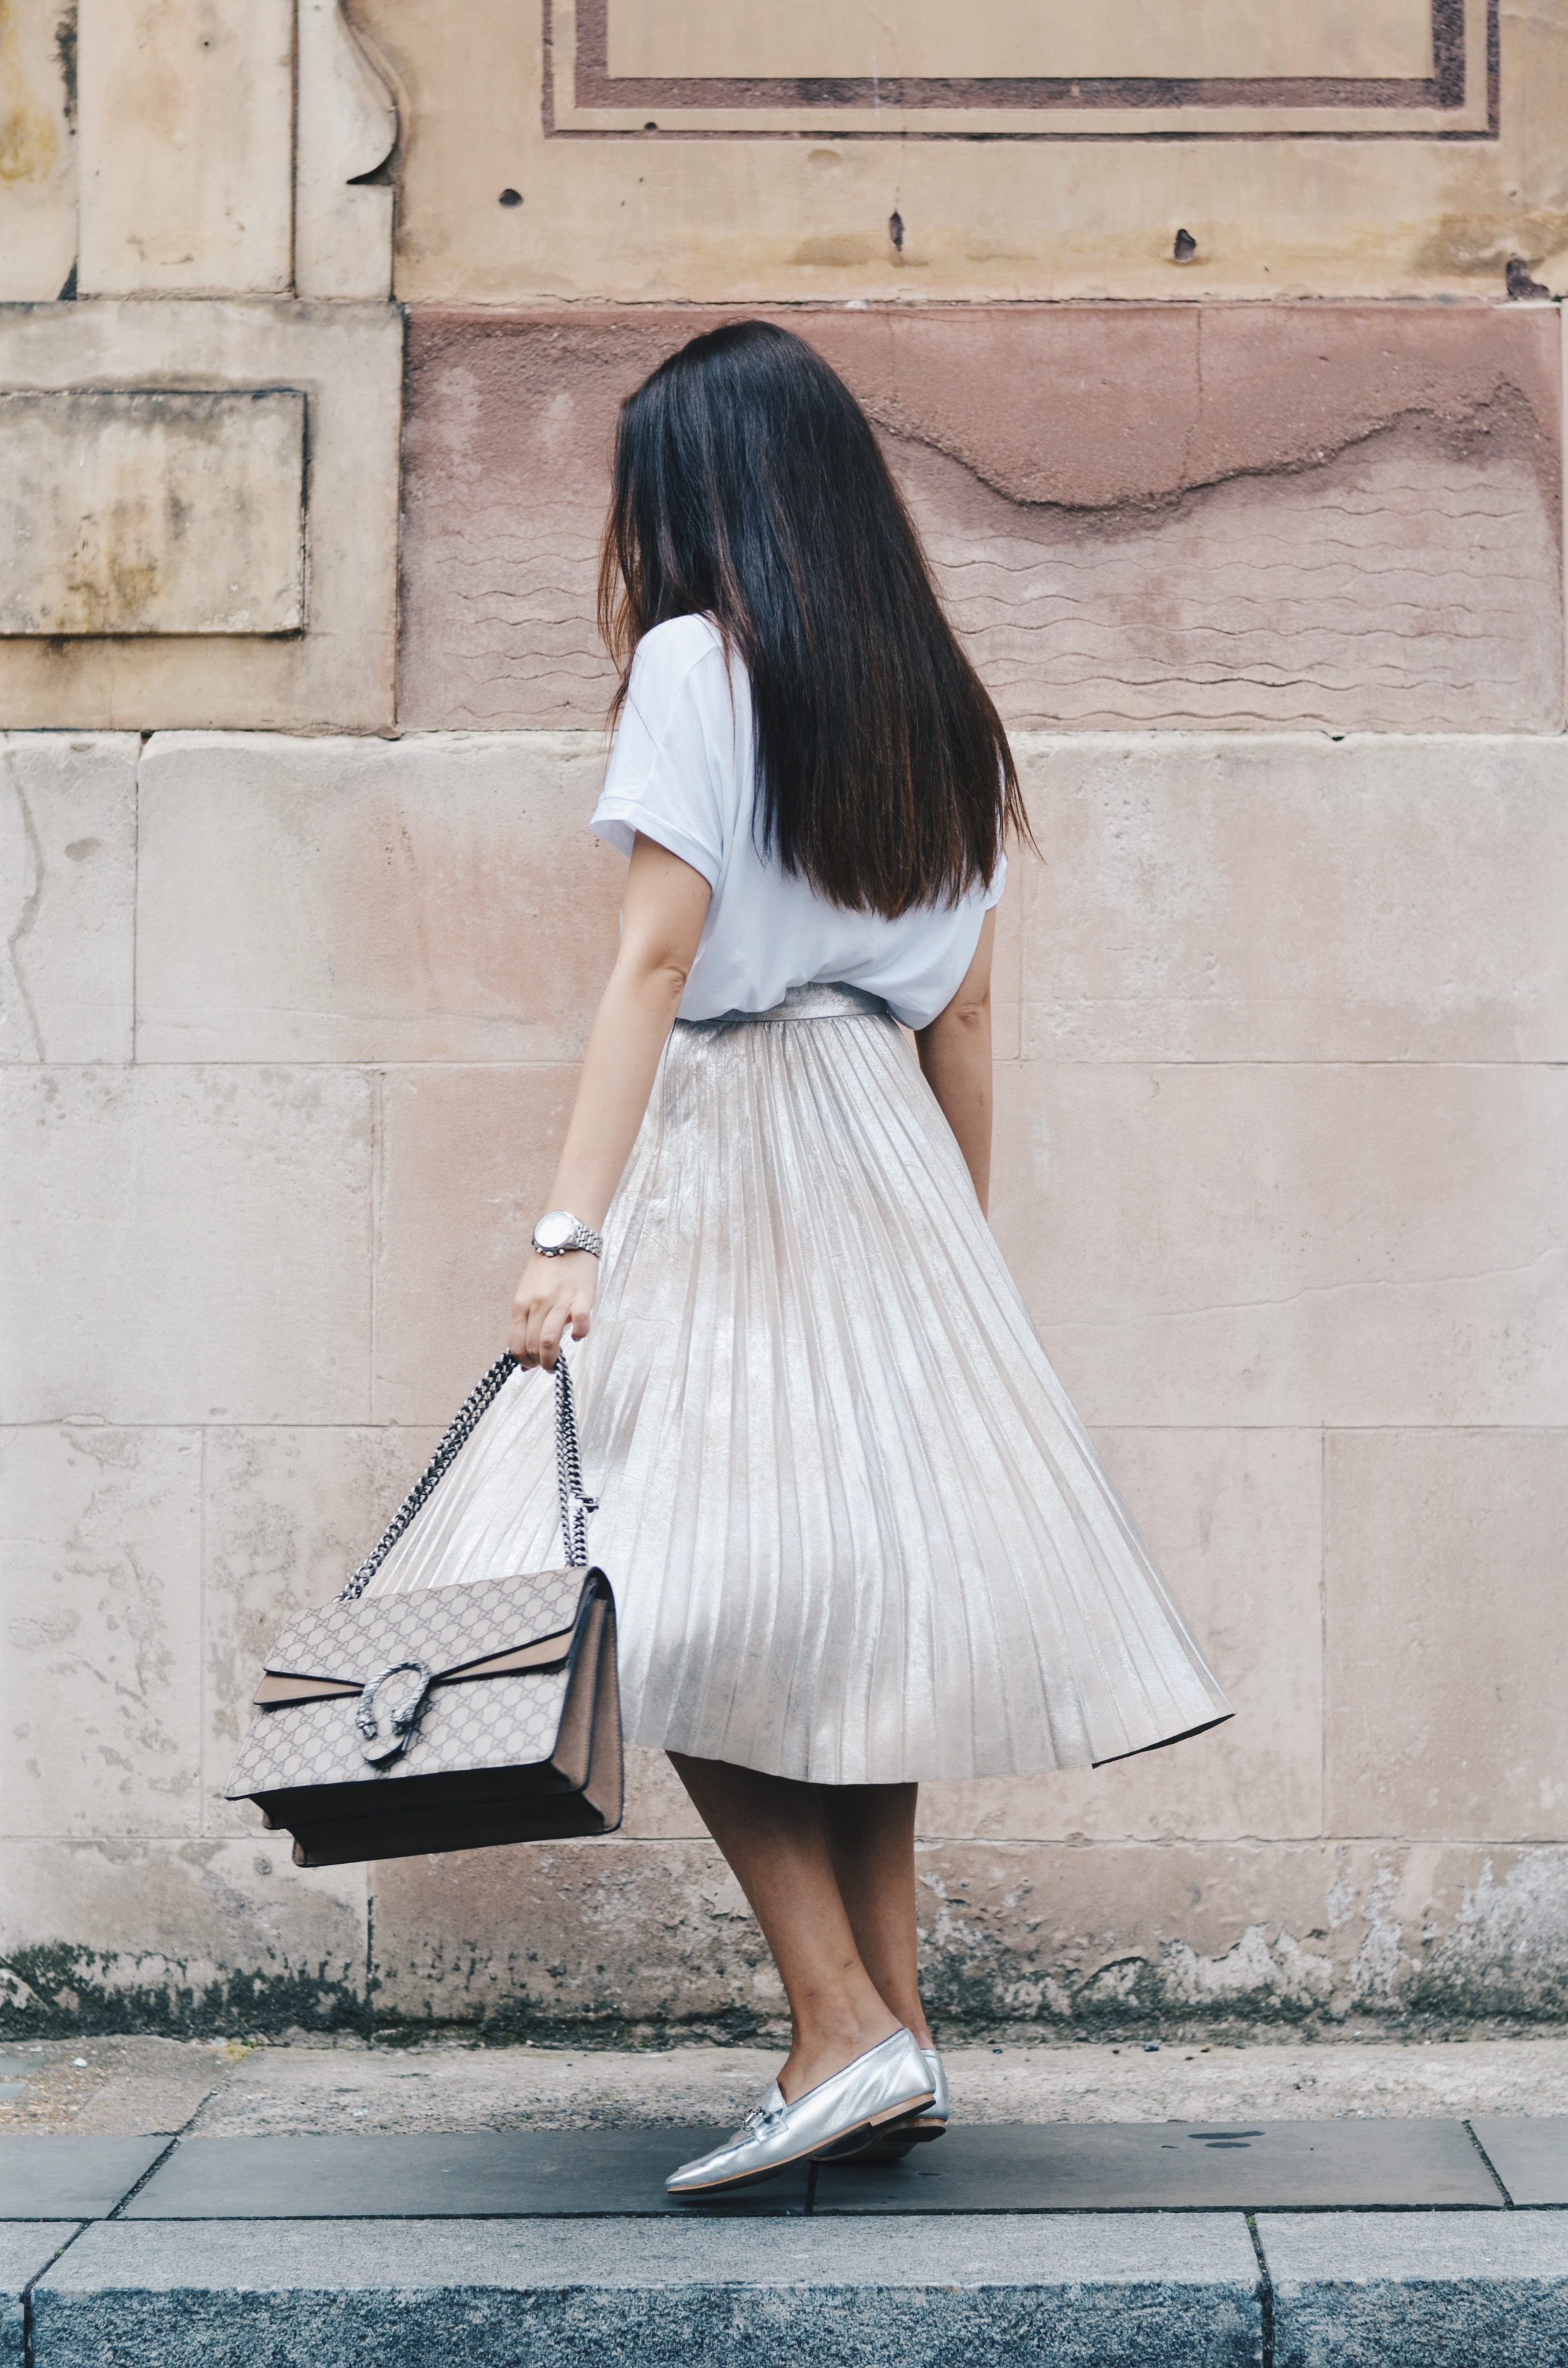 Top: ZARA   Skirt: ZARA   Shoes: Office   Bracelet: Tiffany & Co   Watch: Thomas Sabo   Bag: Gucci